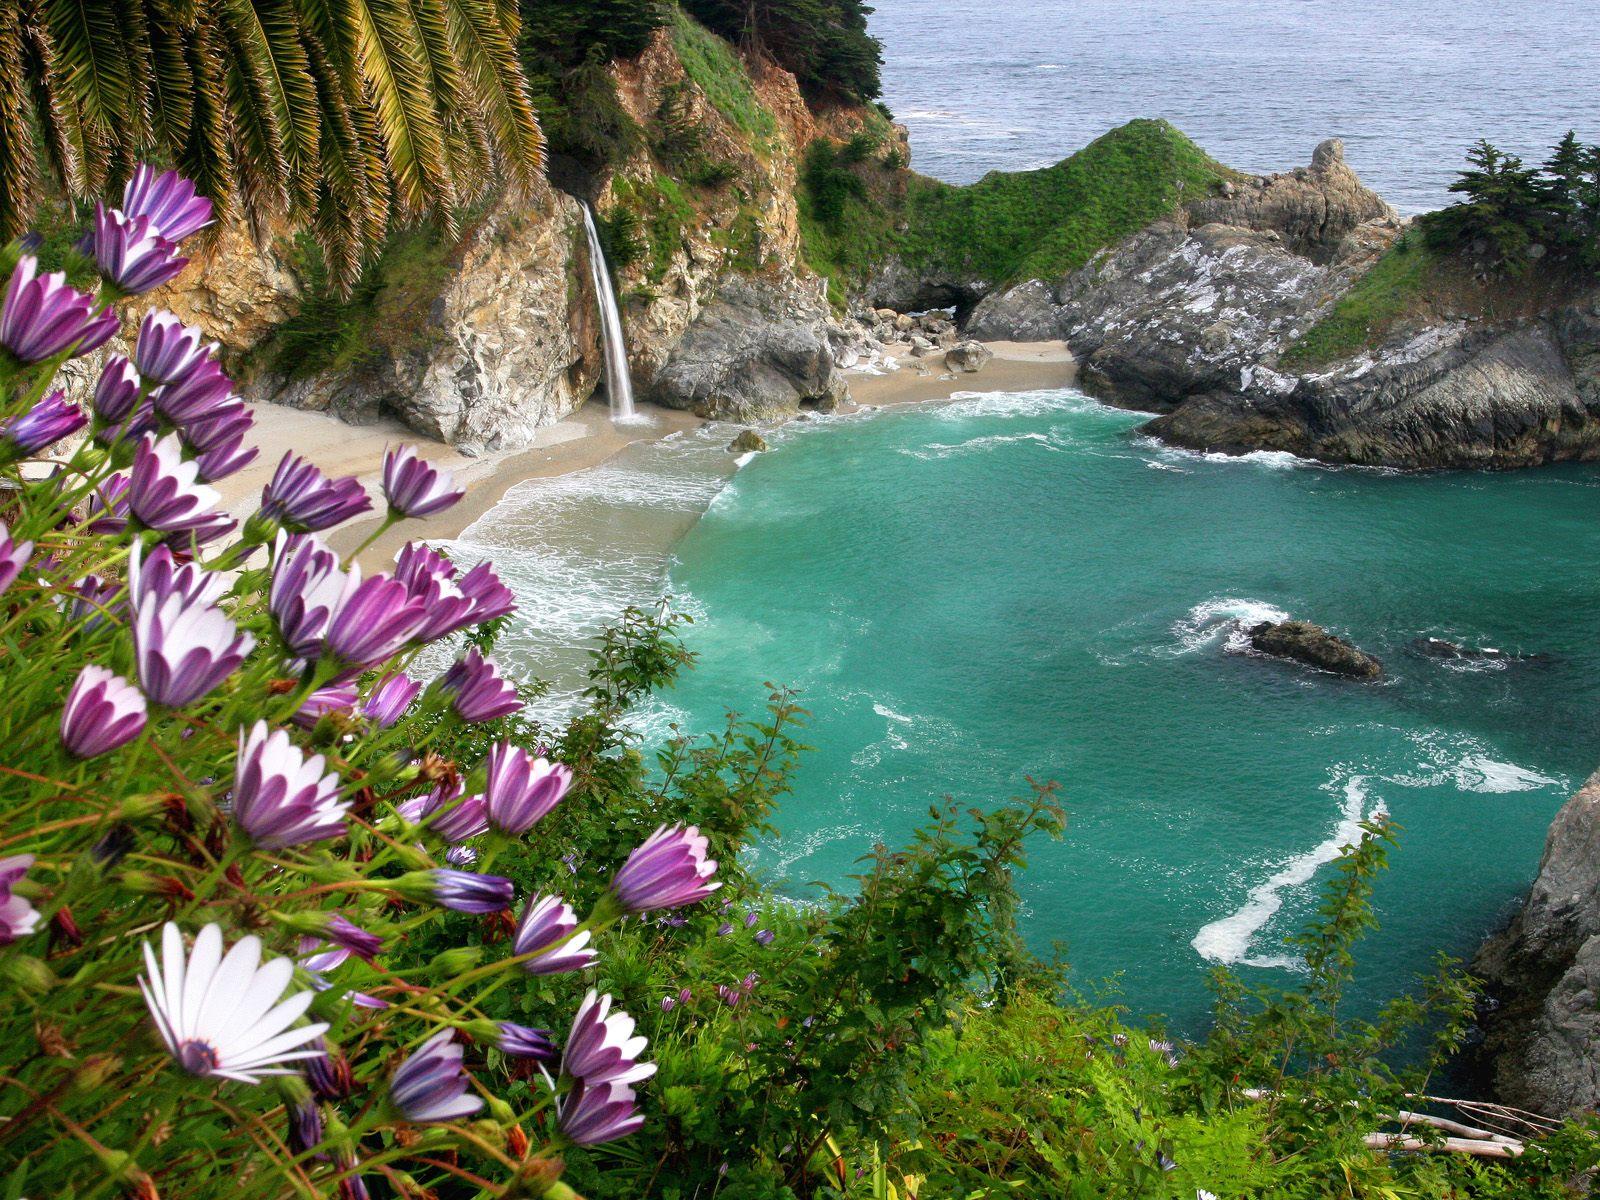 Hermosas Fotos De Paisajes Y De La Naturaleza Taringa